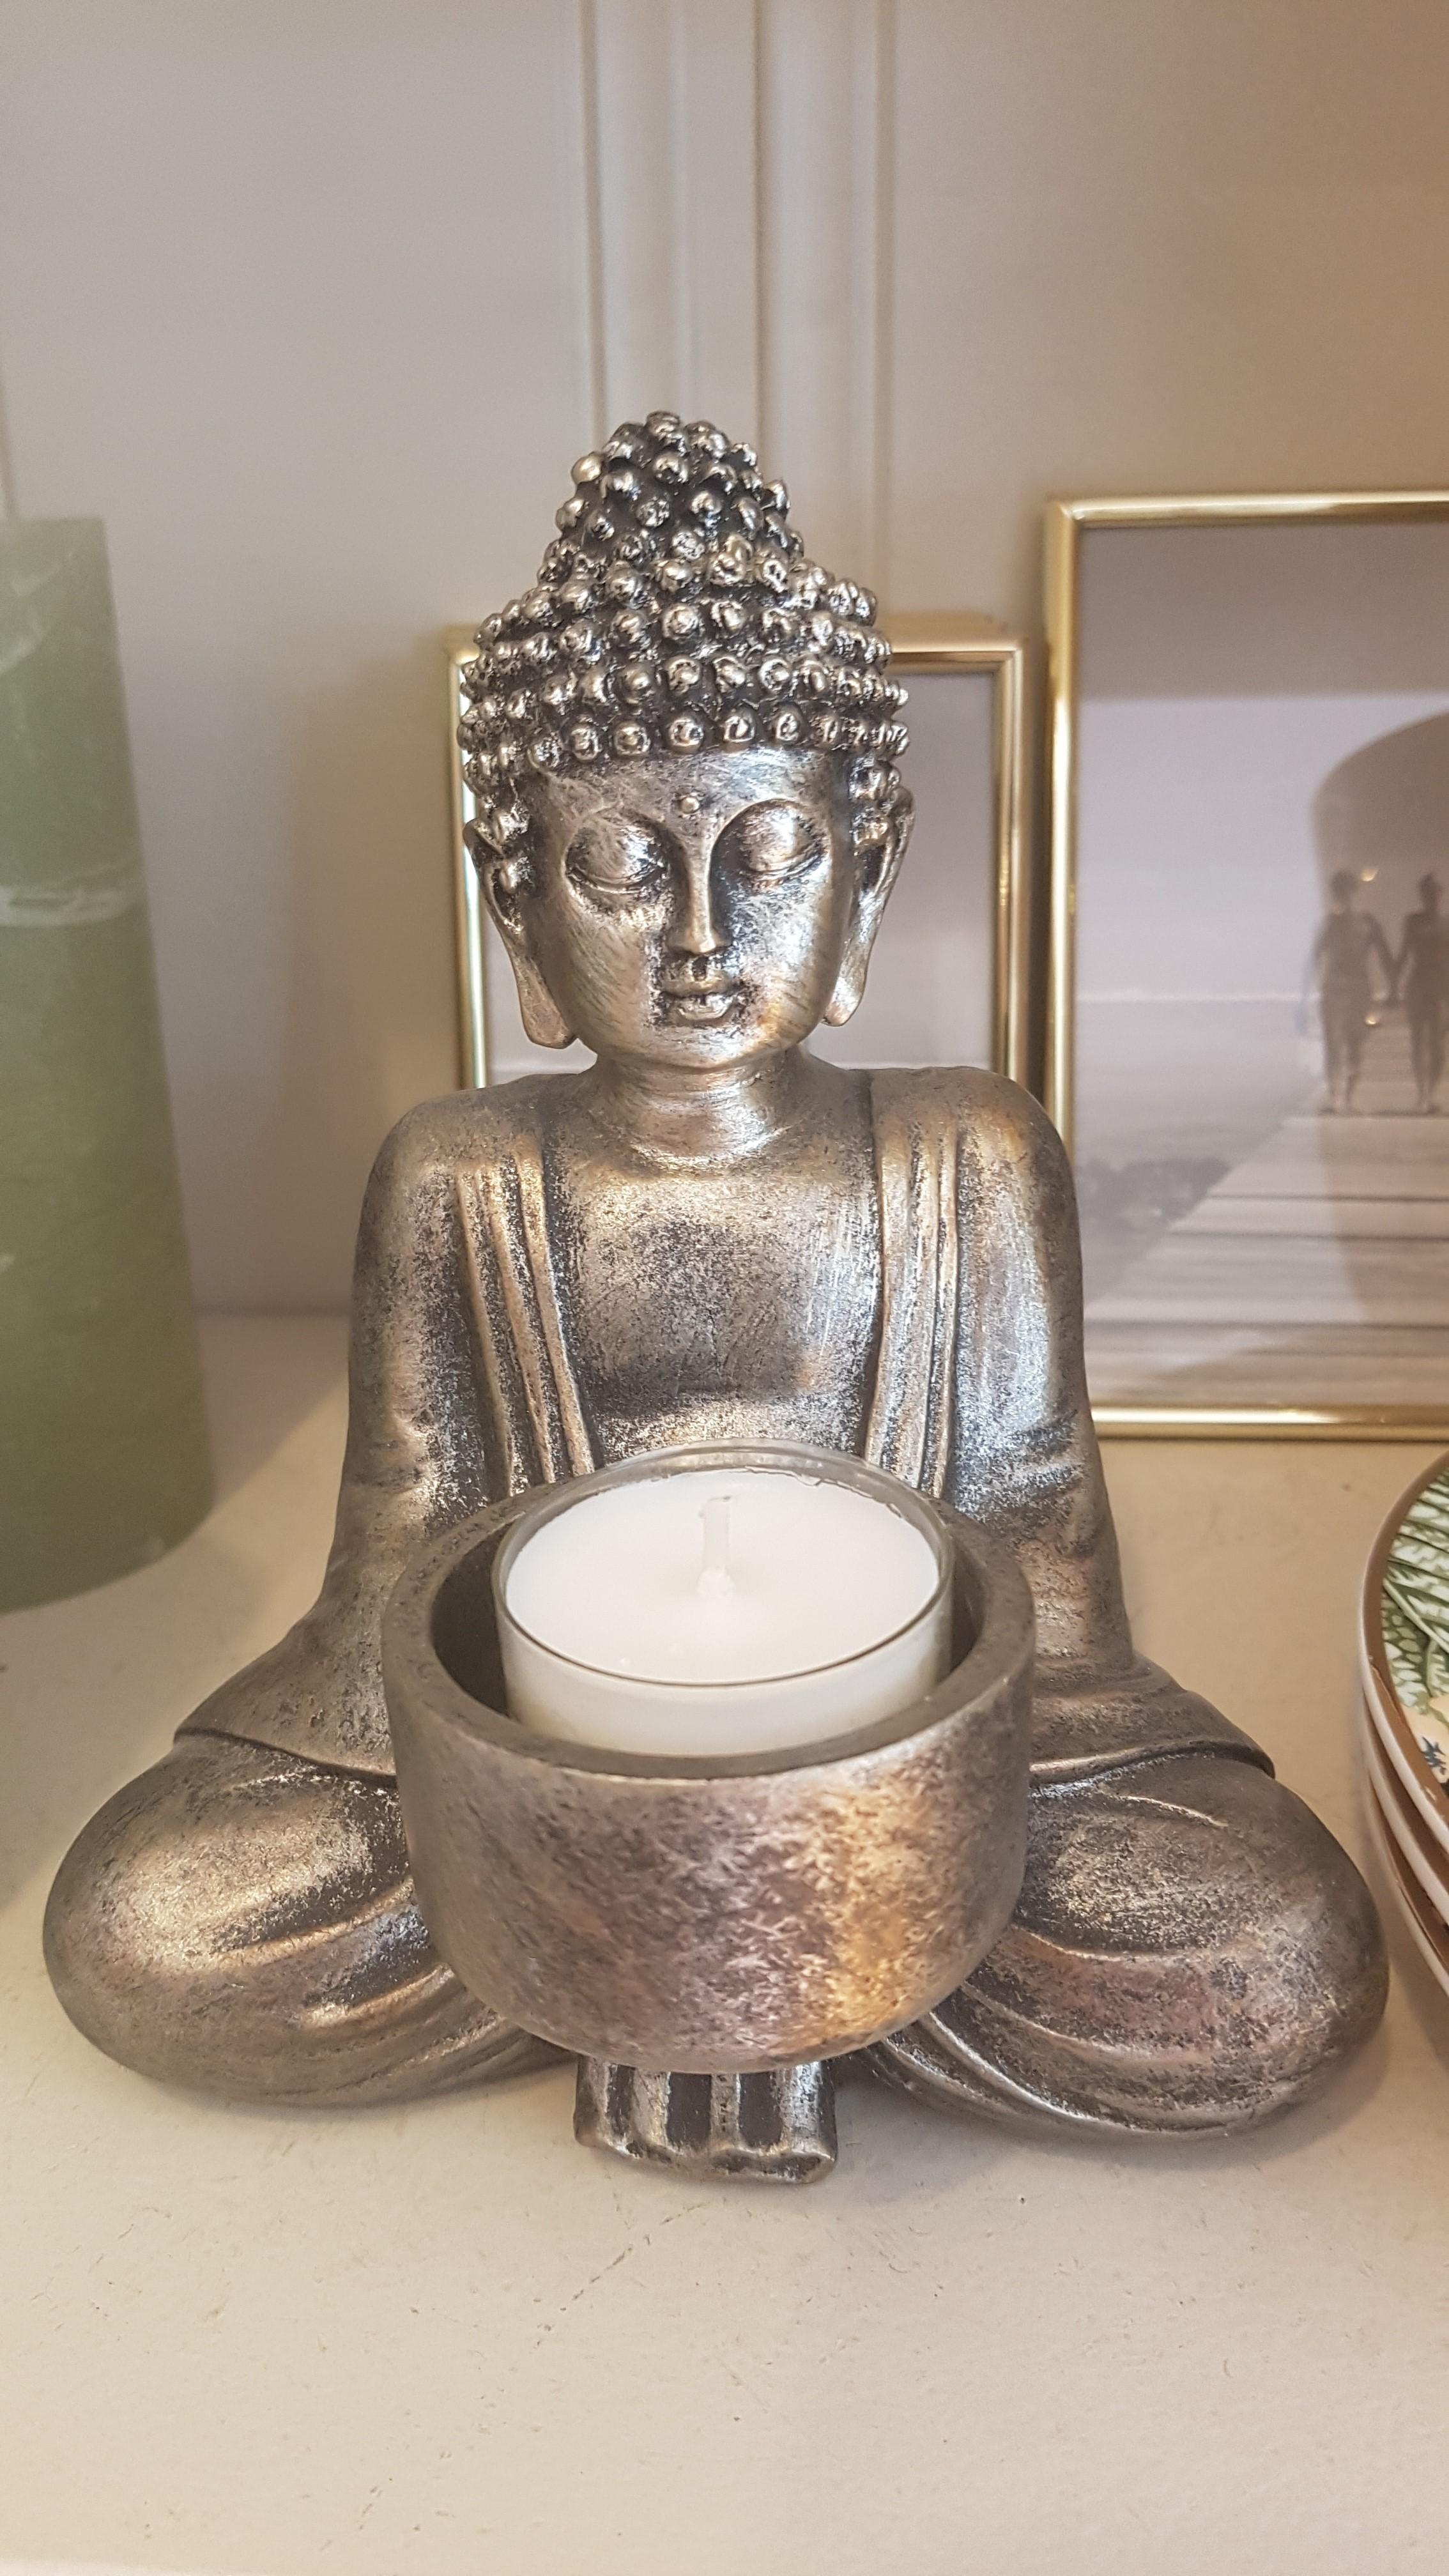 La Vida Buddha Teelichthalter